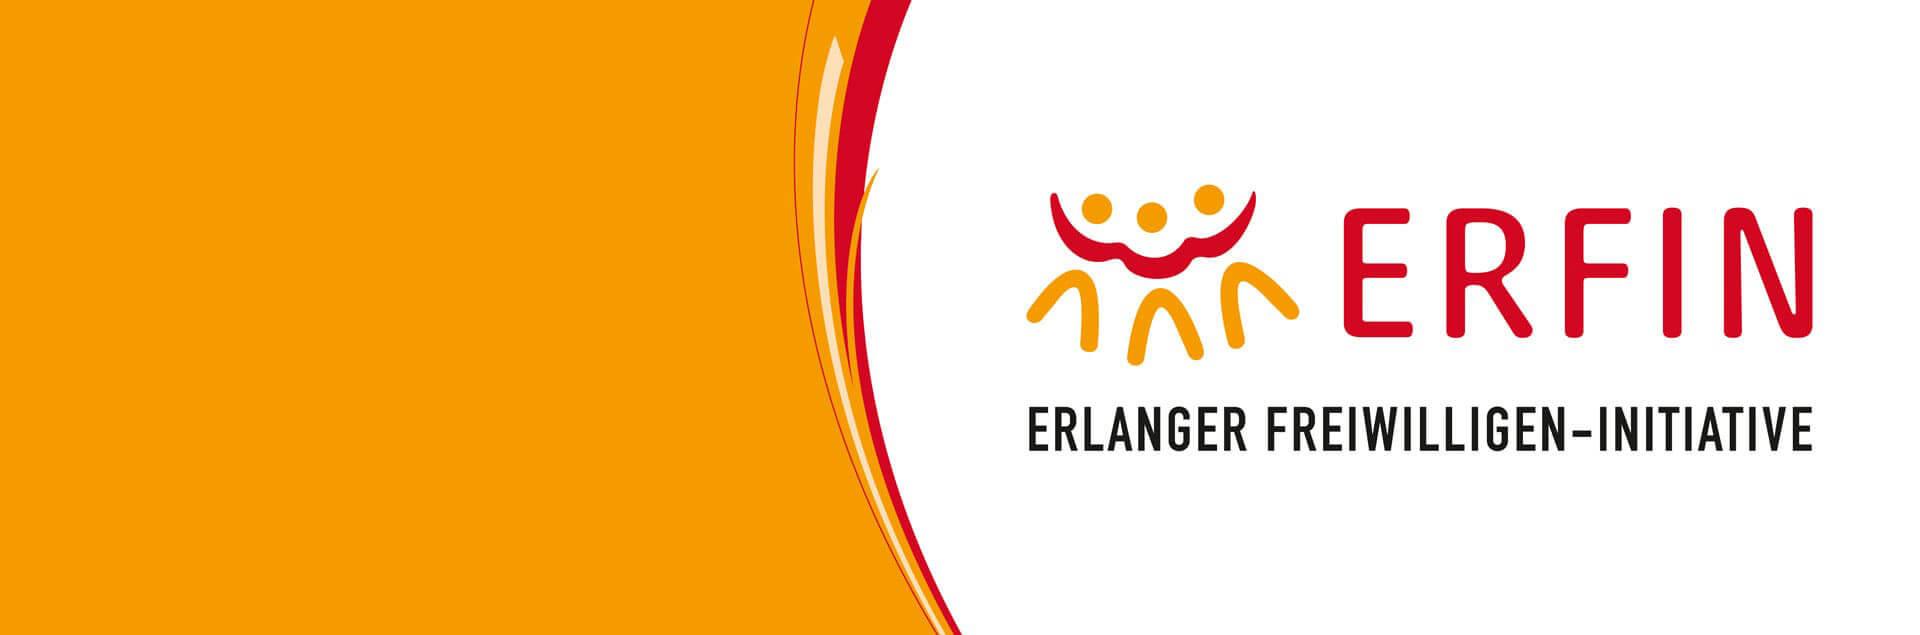 ERFIN-Erlanger-Freiwilligeninitiative